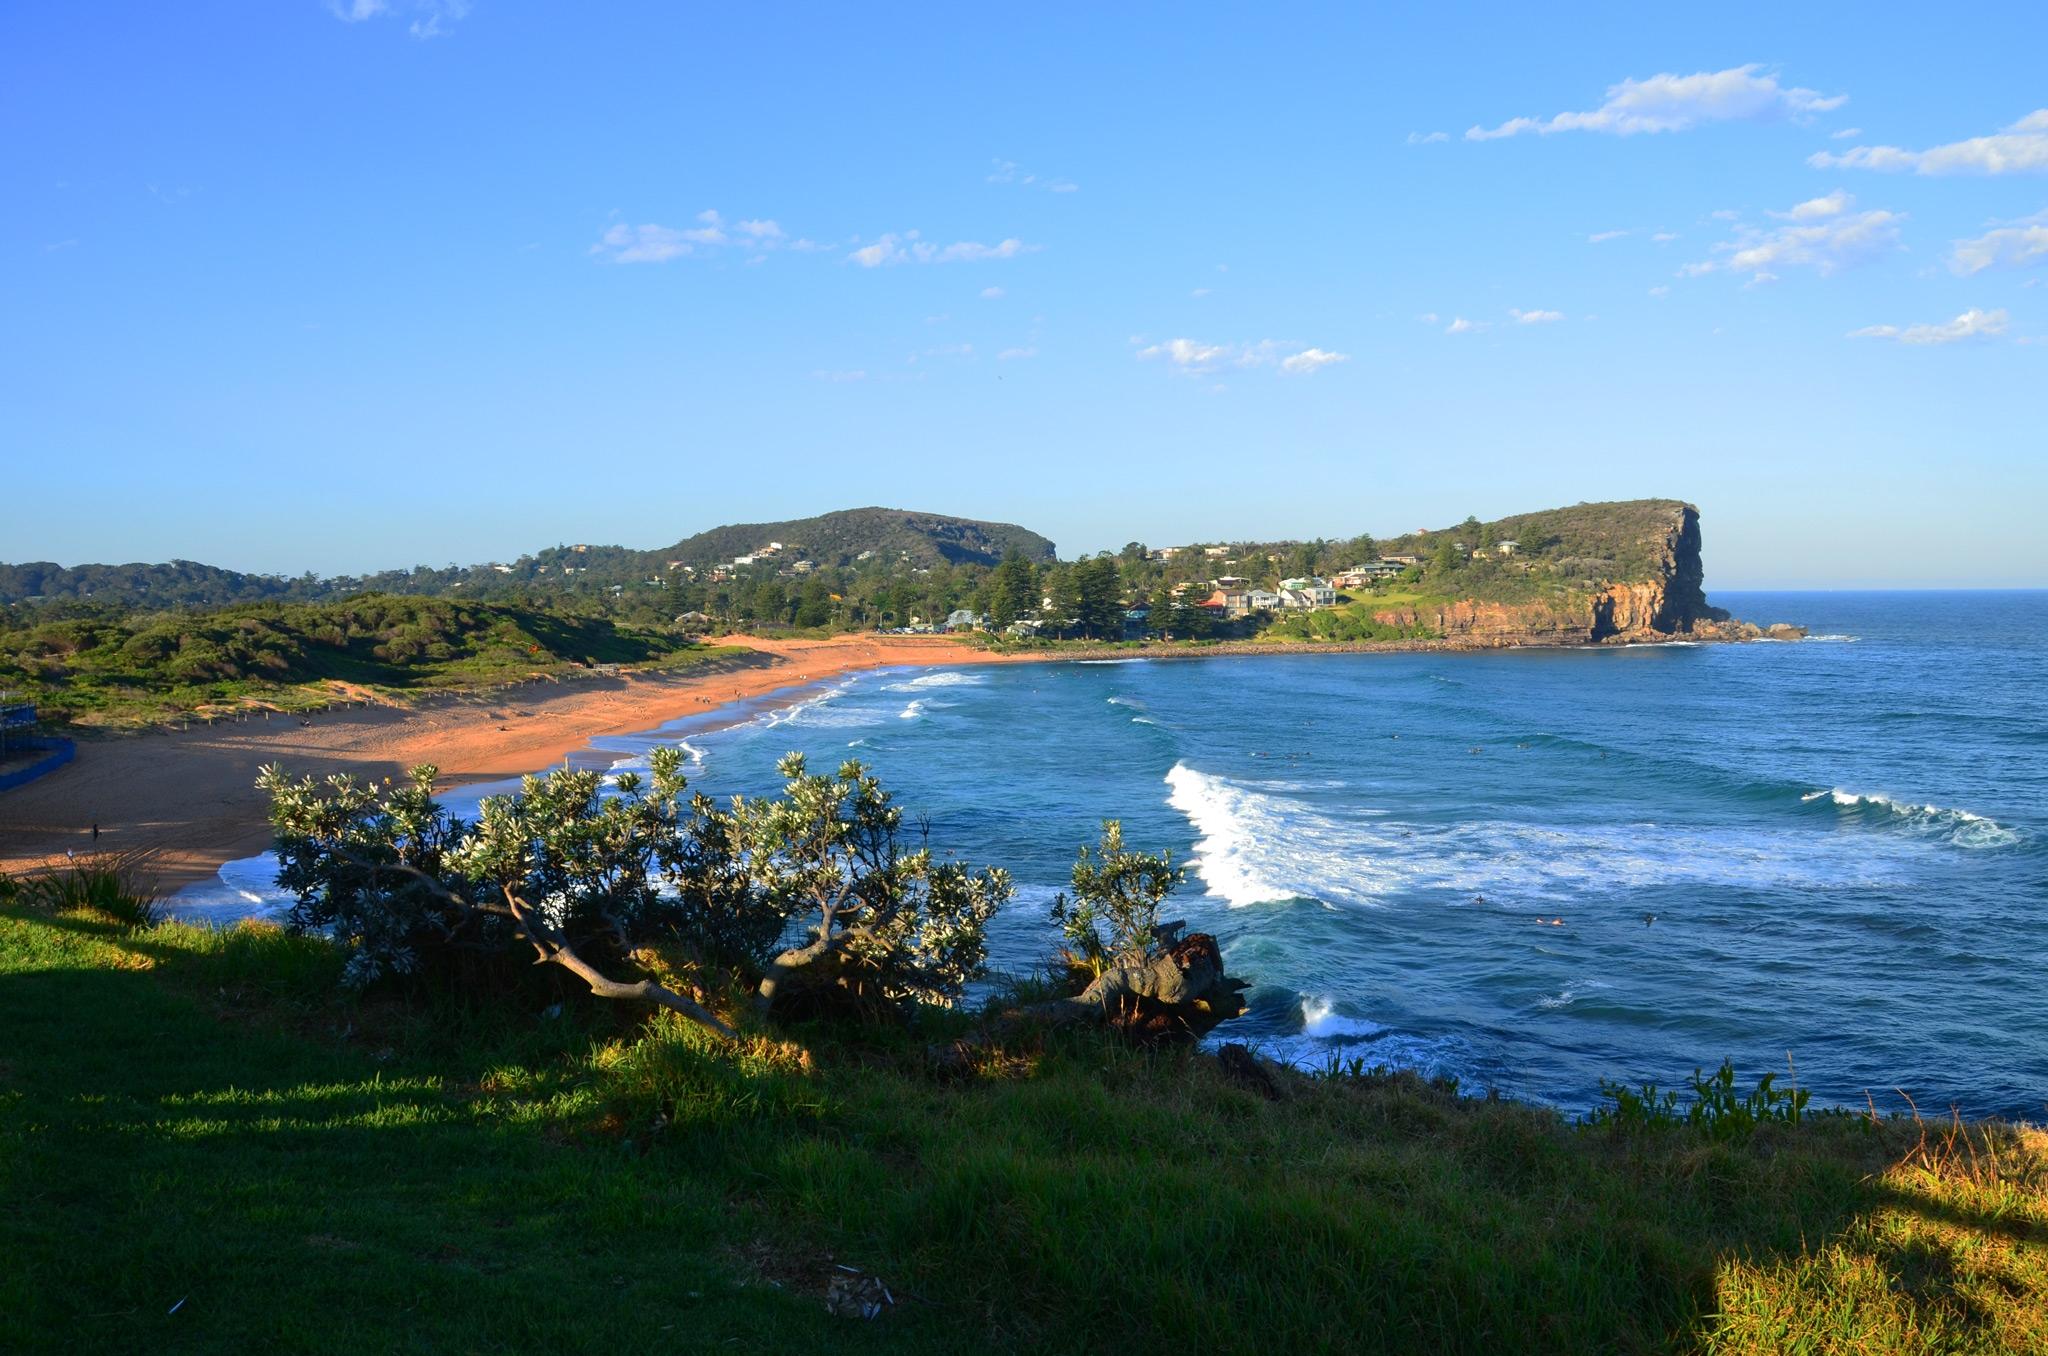 Avalon Beach -Image ©2014 ManlyAustralia.com